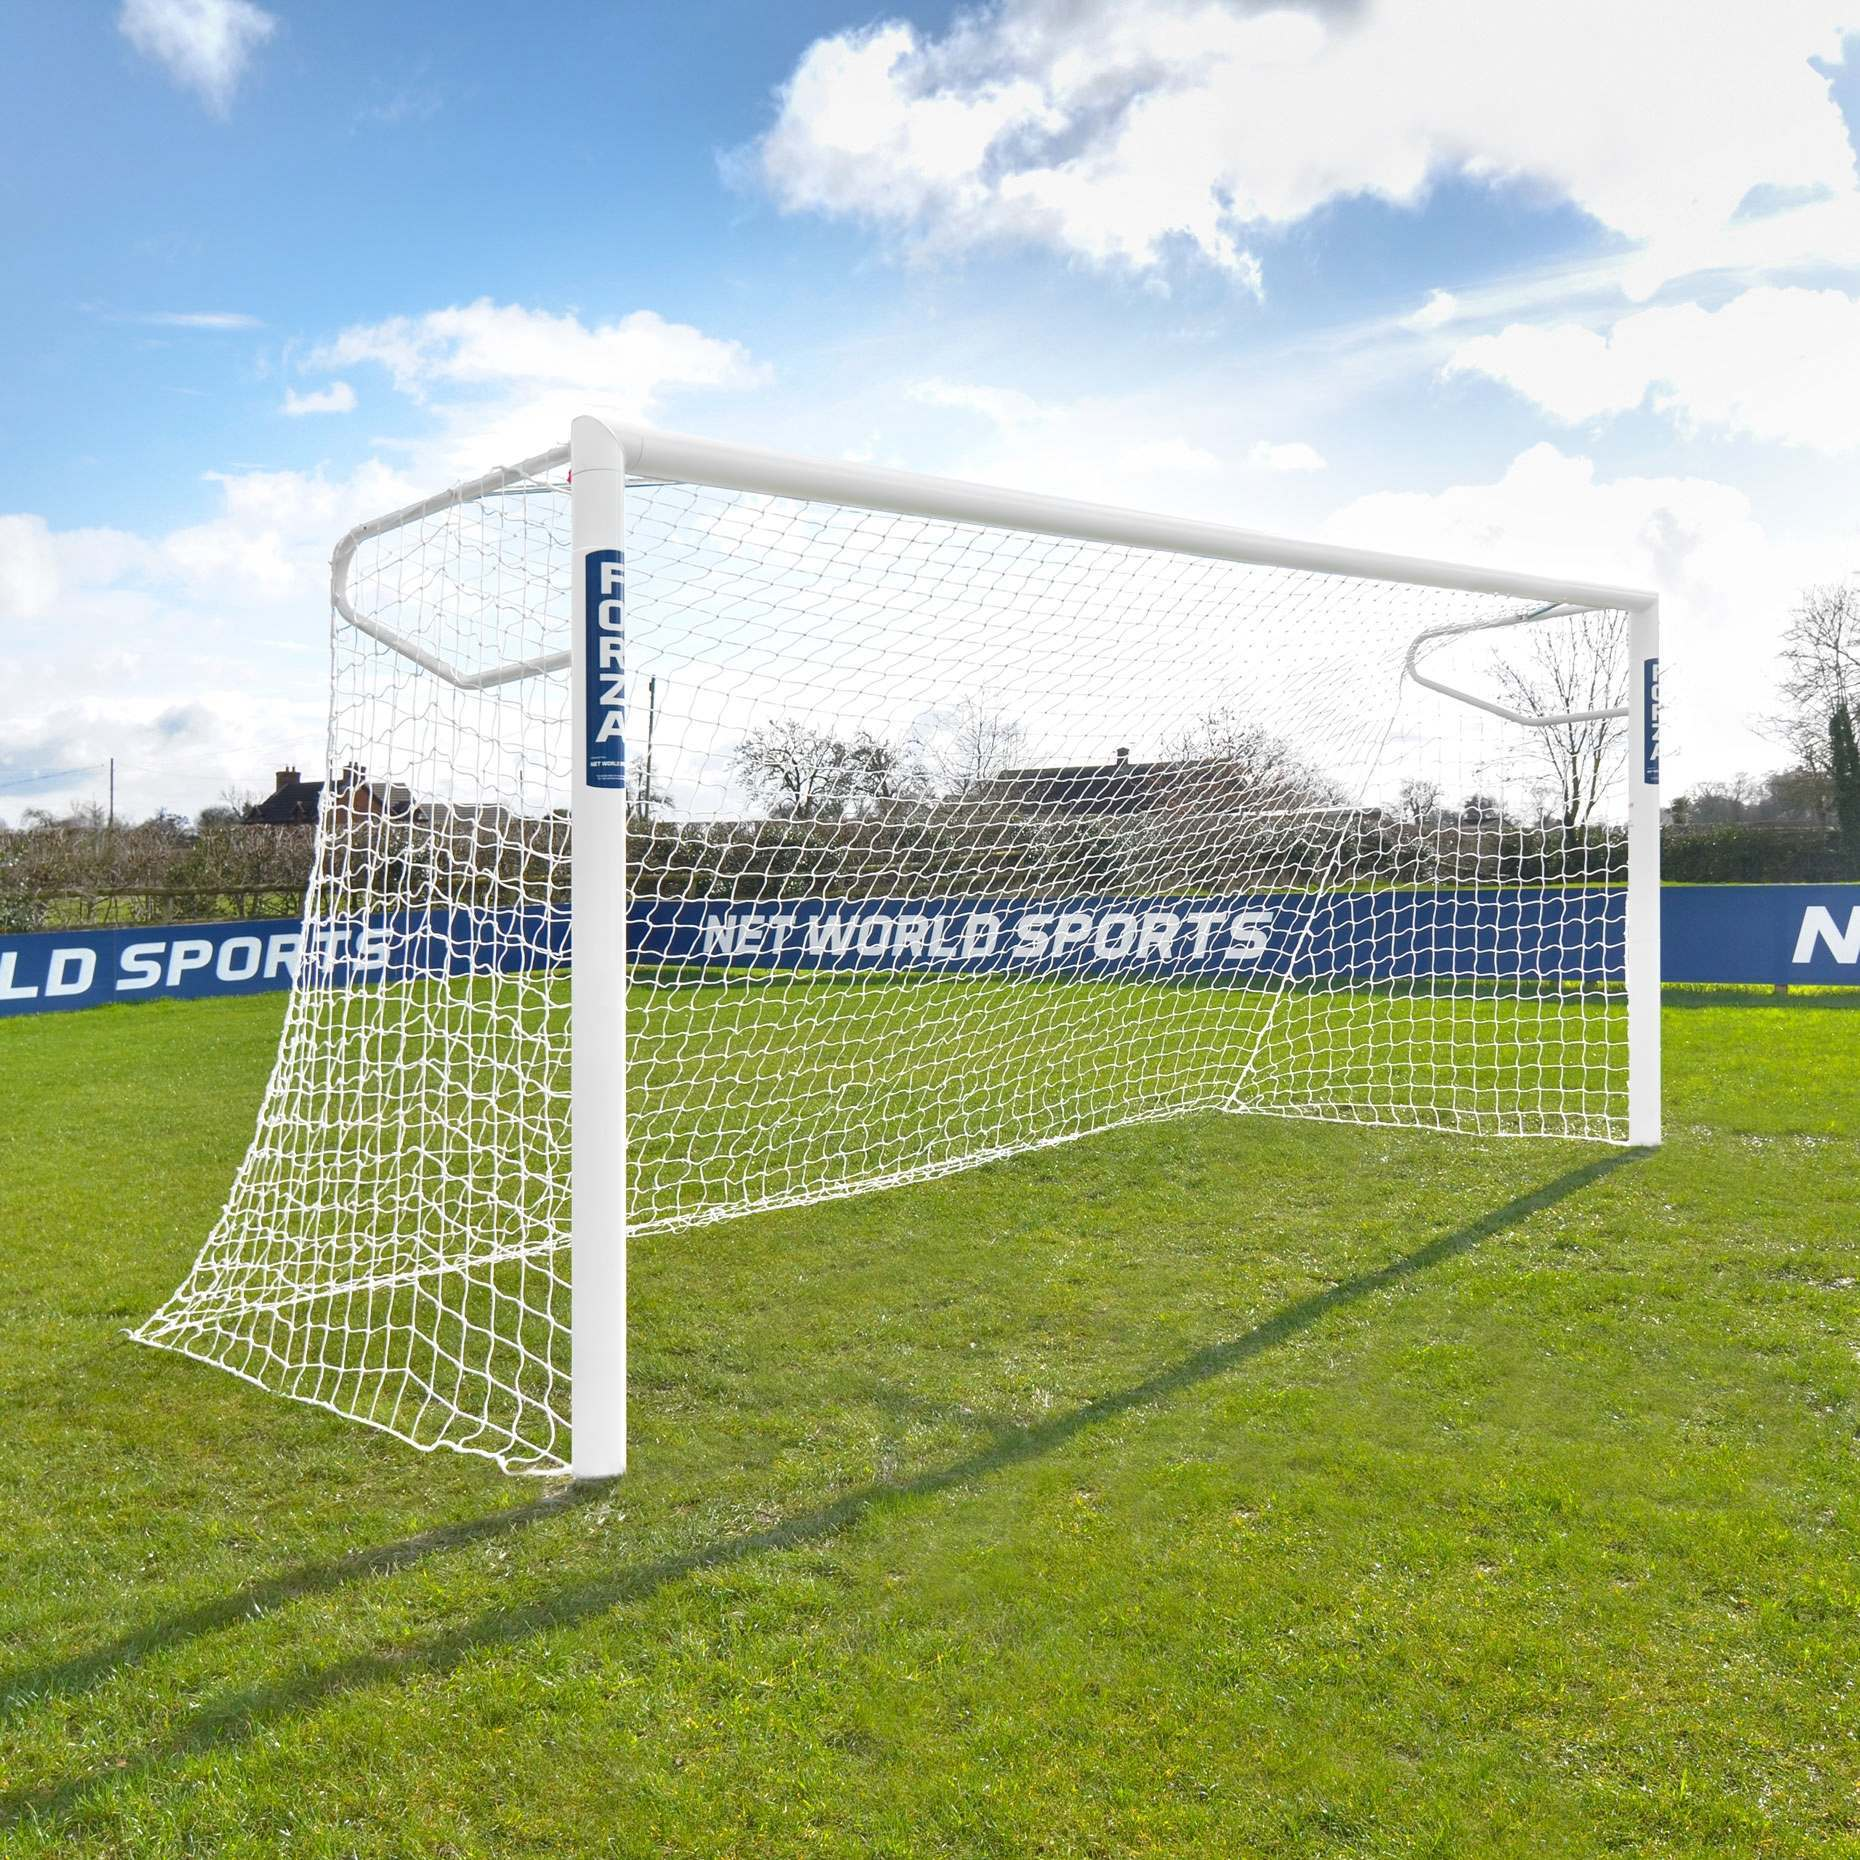 12 x 6 FORZA Alu110 Socketed Football Goal - Single Goal